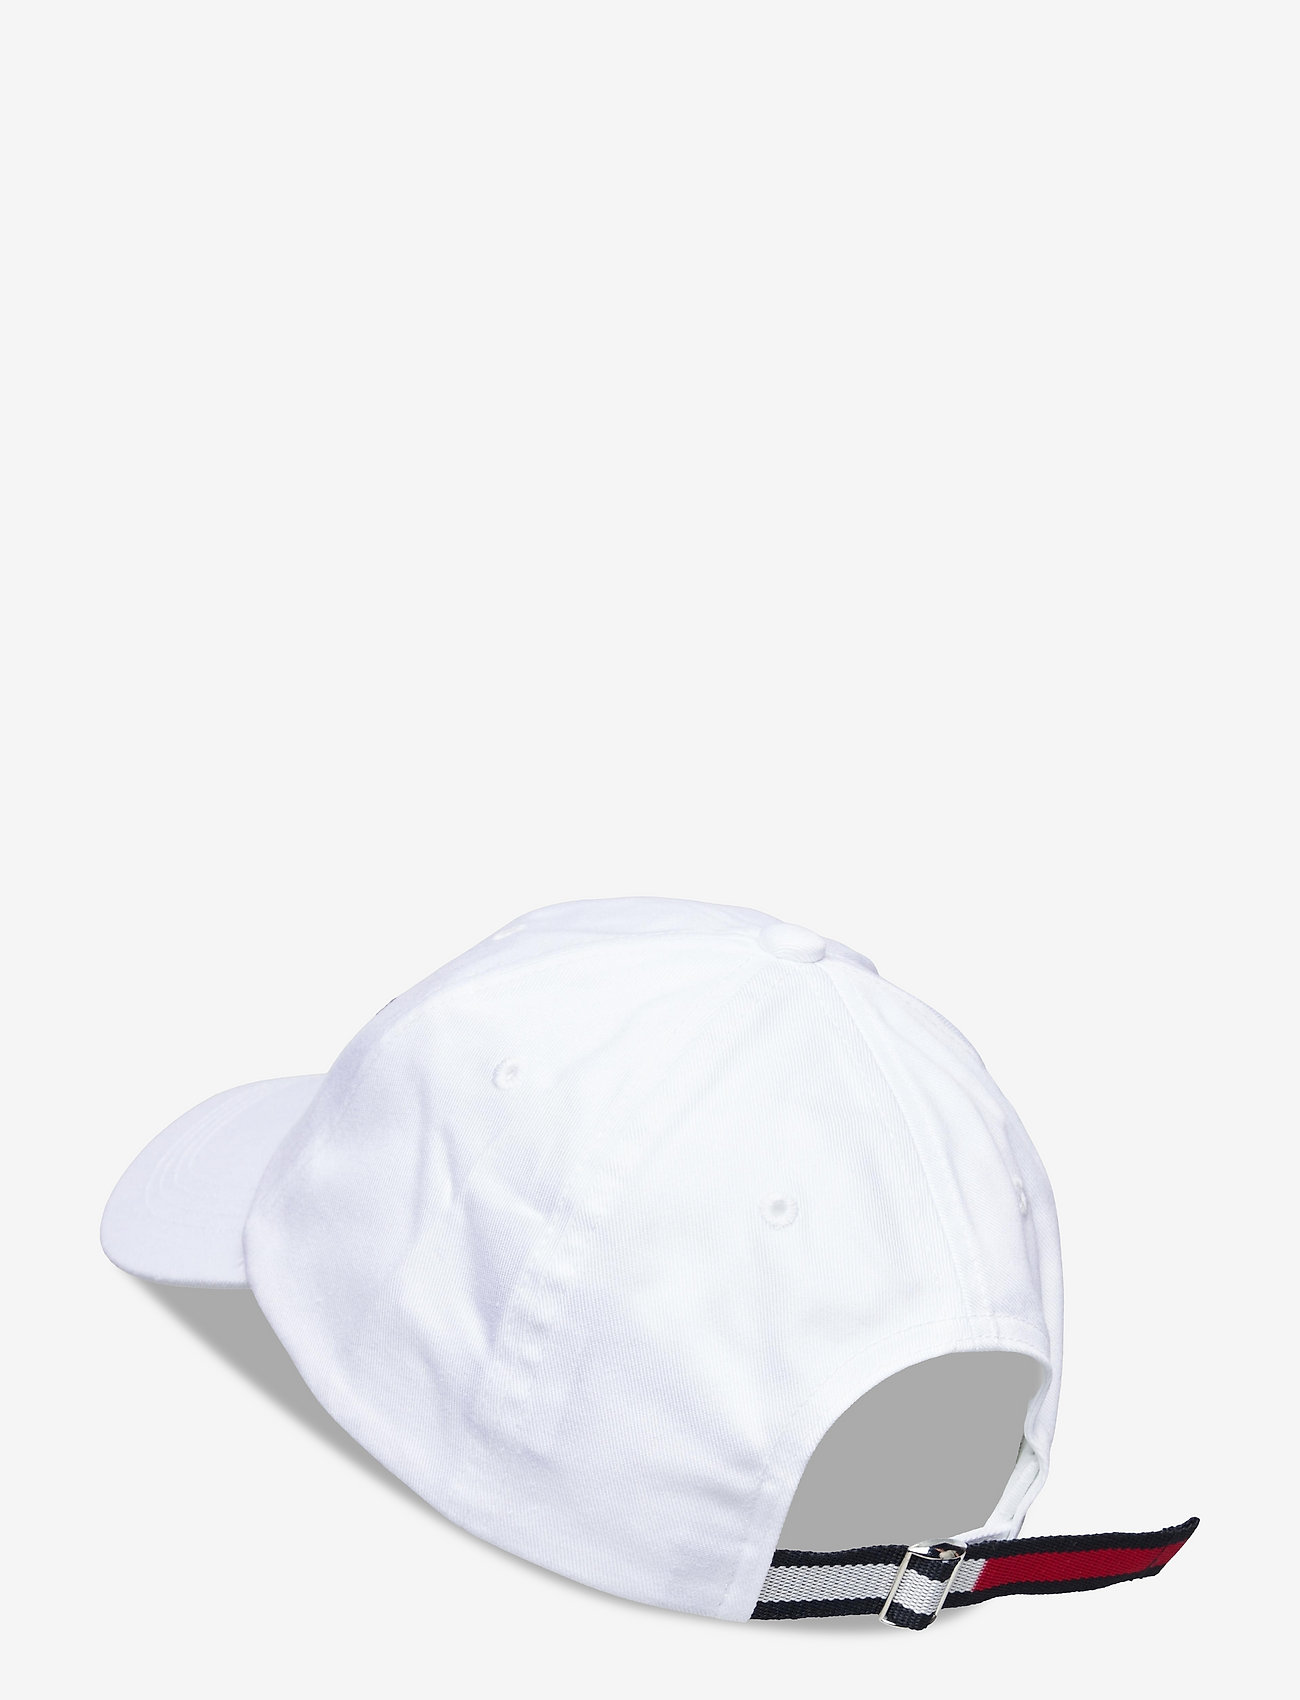 Tommy Hilfiger - TJM SPORT CAP - czapki - white - 1